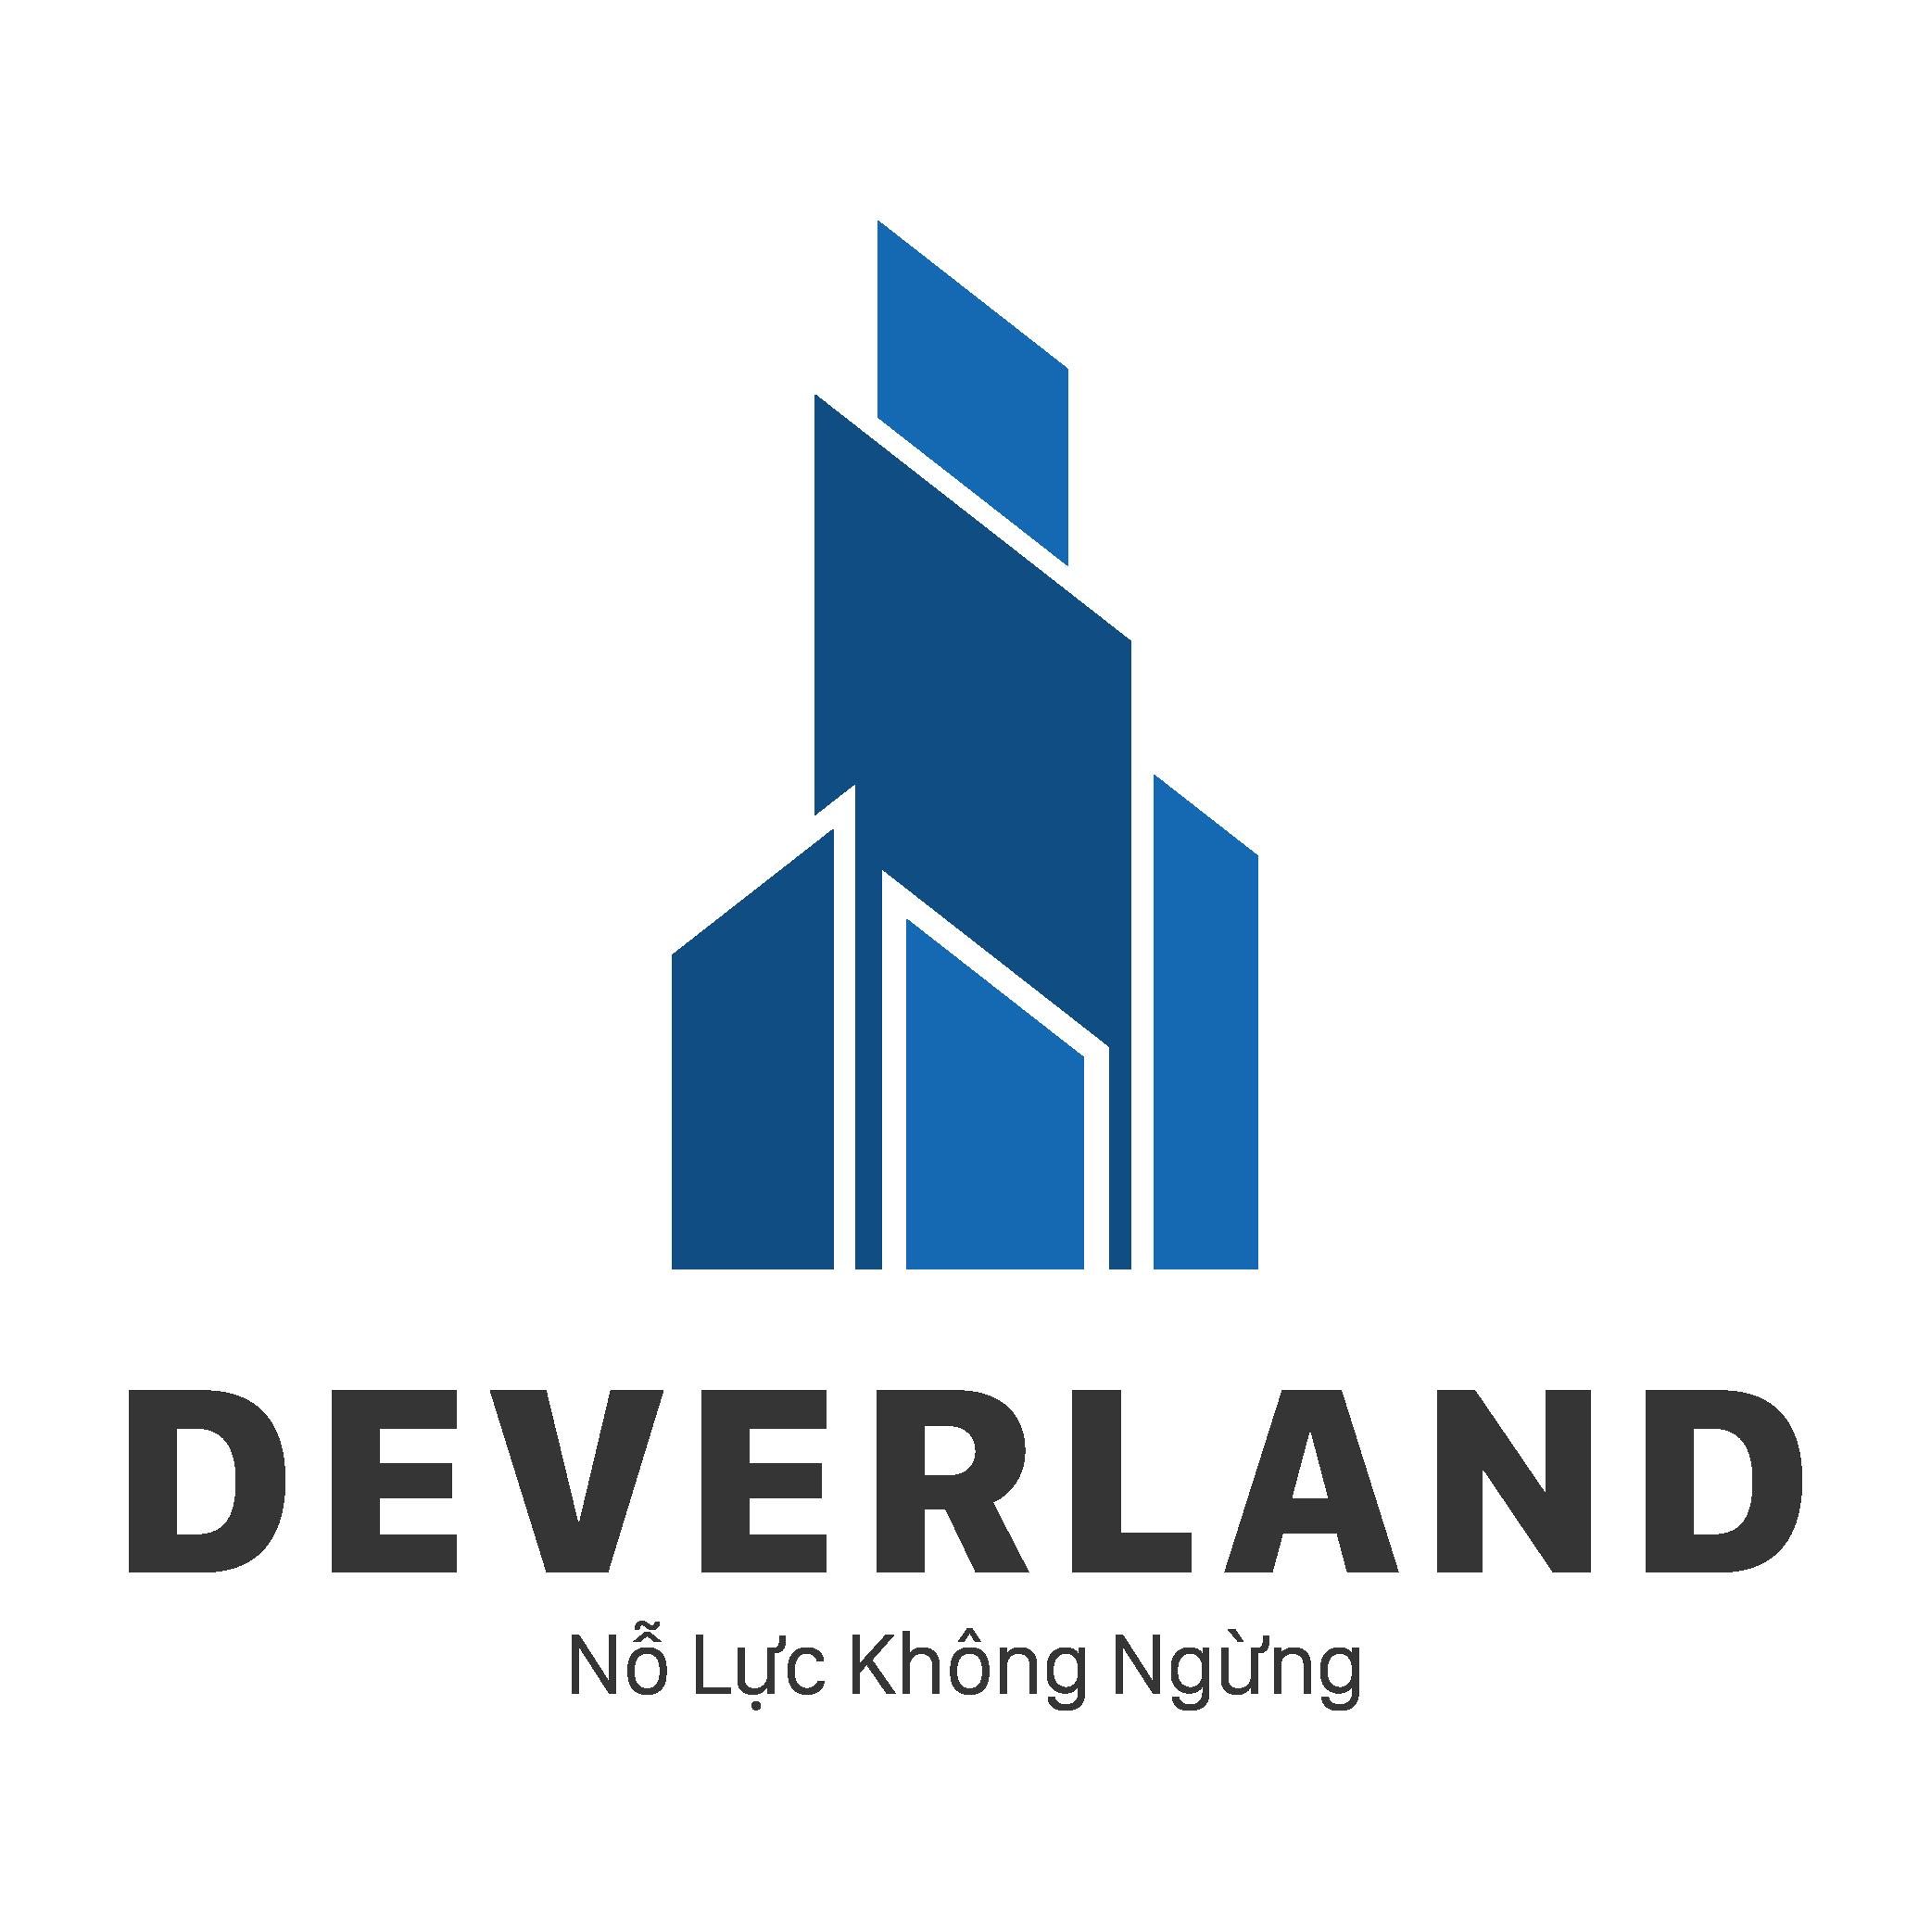 Deverland